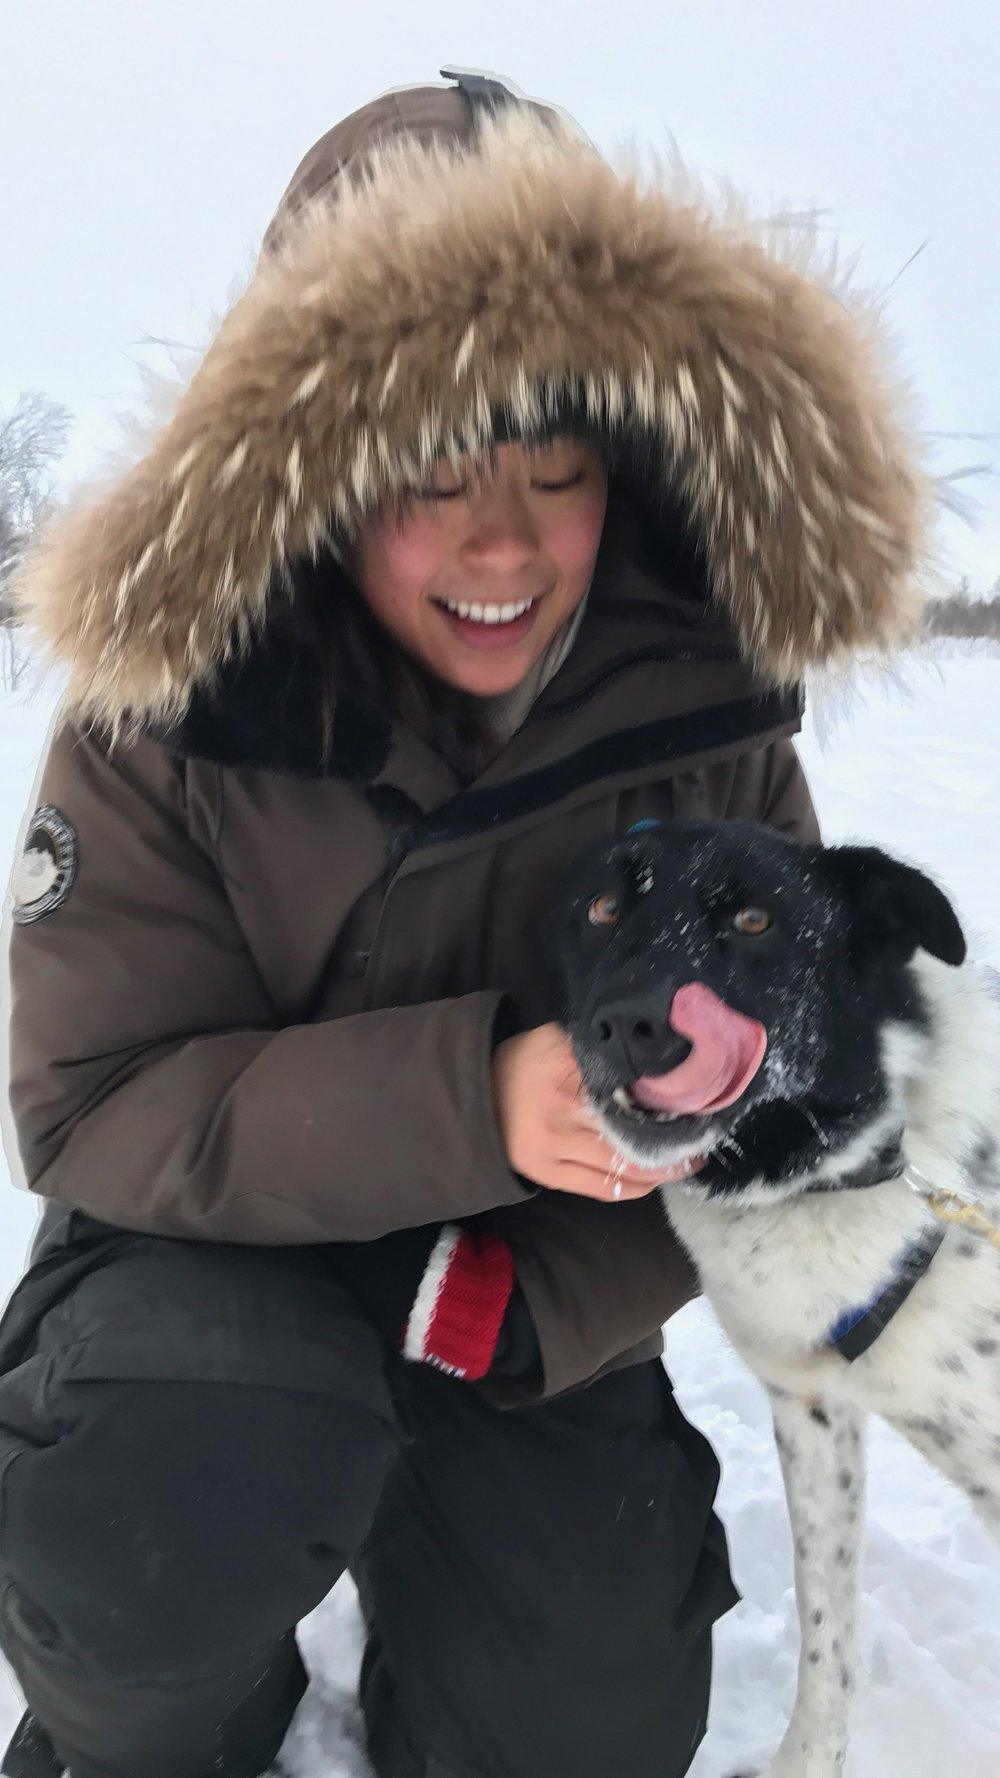 Dog girl, overjoyed to meet a real-life sled dog. Basically Balto.